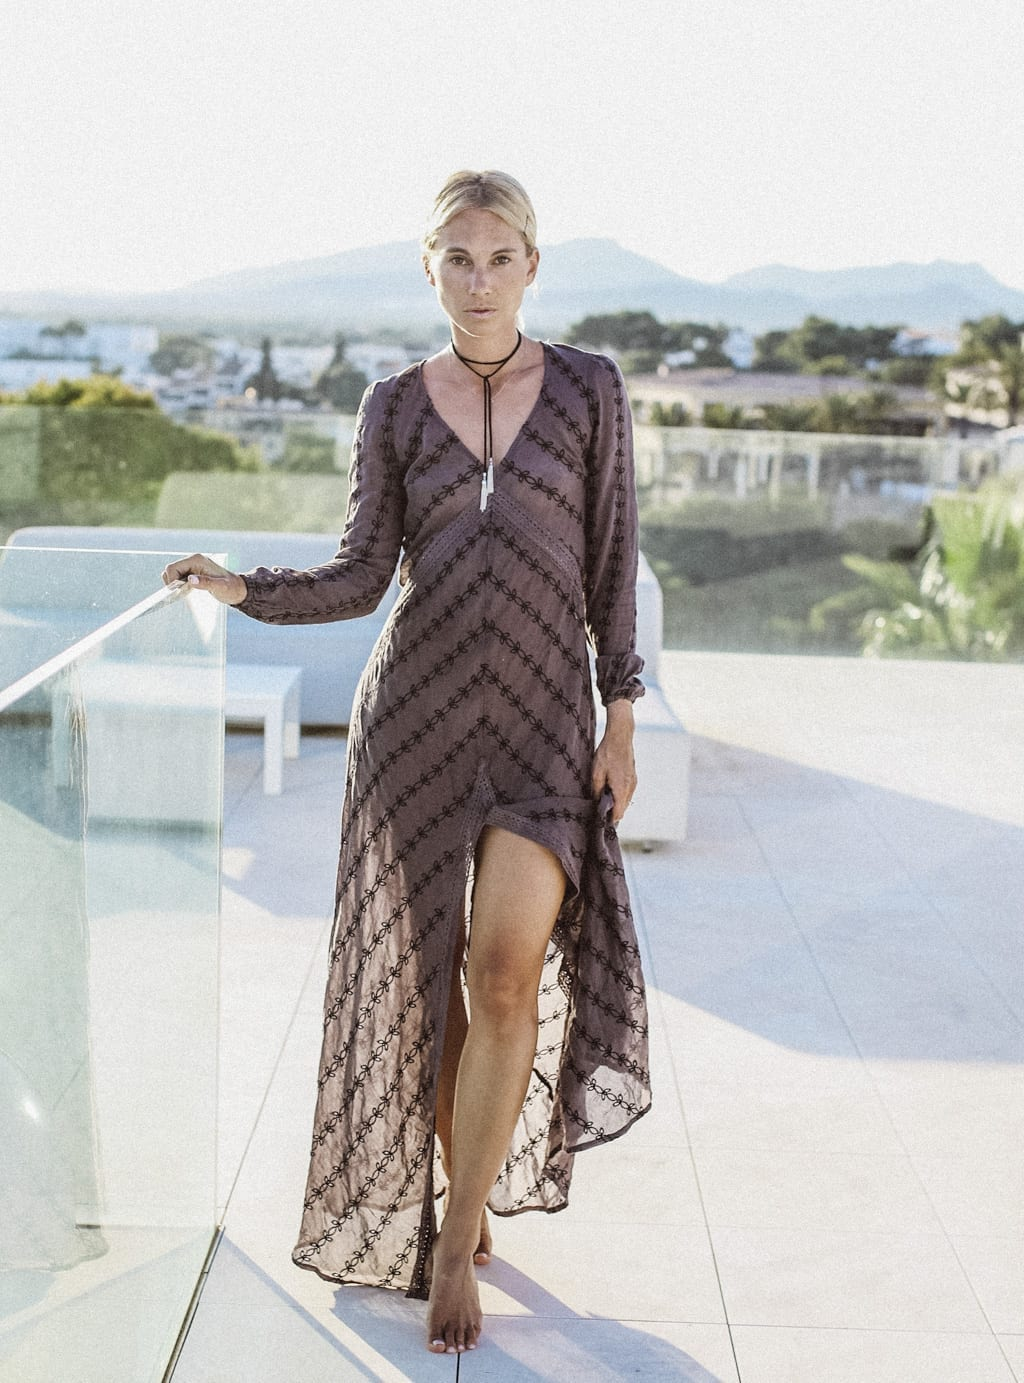 CK-1606-Mallorca-Island-Spain-Luxury-Holiday-Blogger-Beach-Outfit-Style-Fashion-Baleares-1013